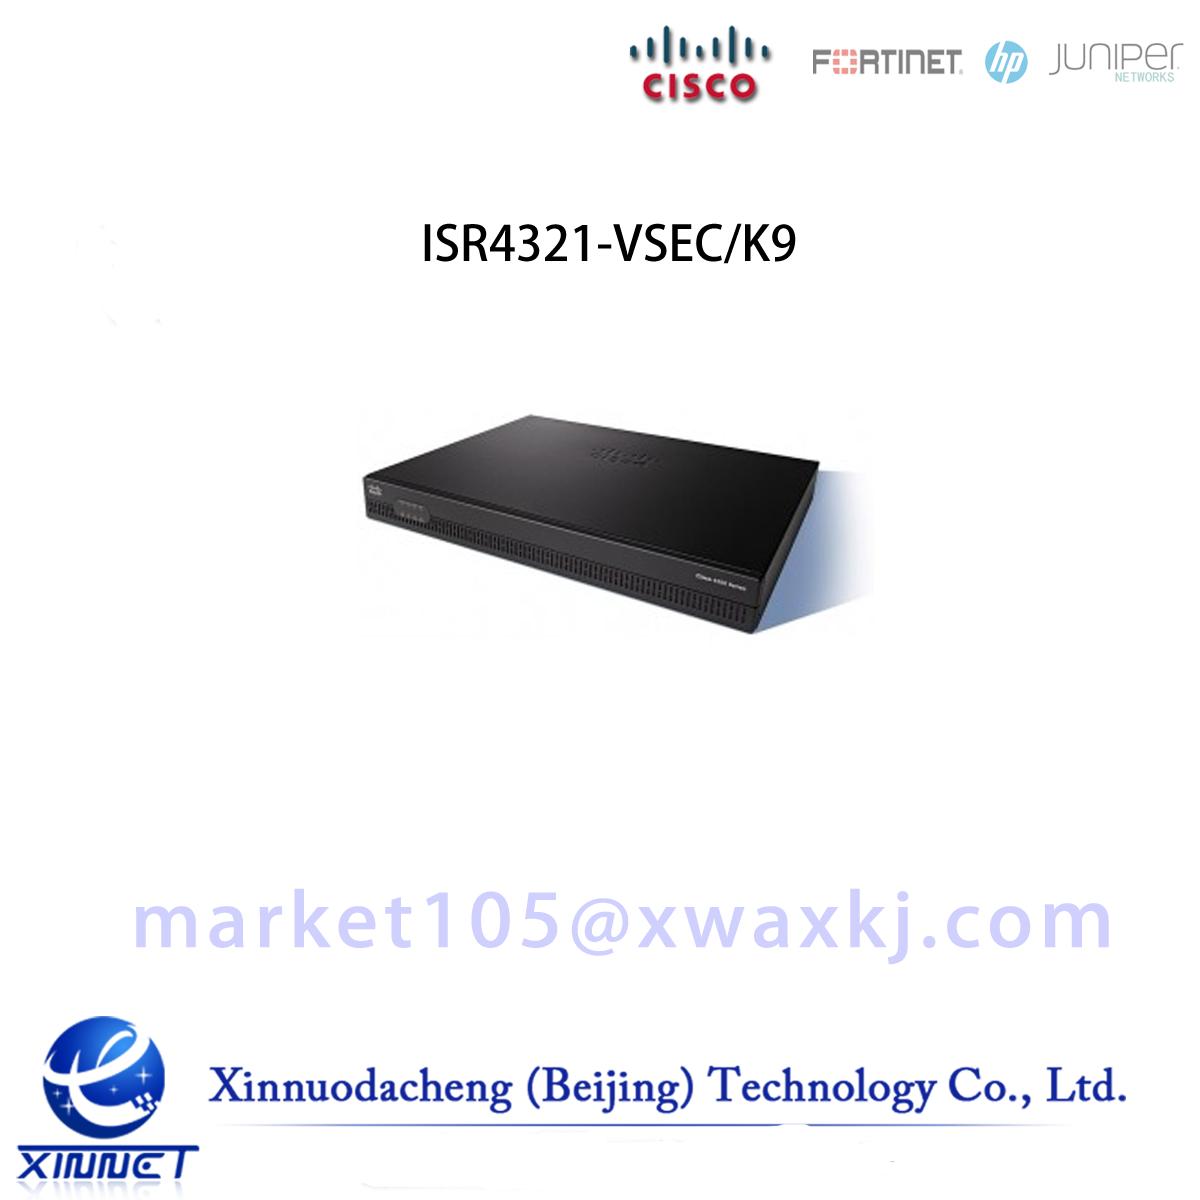 Cisco ISR 4321 Bundle w/UC & SEC License, CUBE-10 ISR4321-VSEC/K9